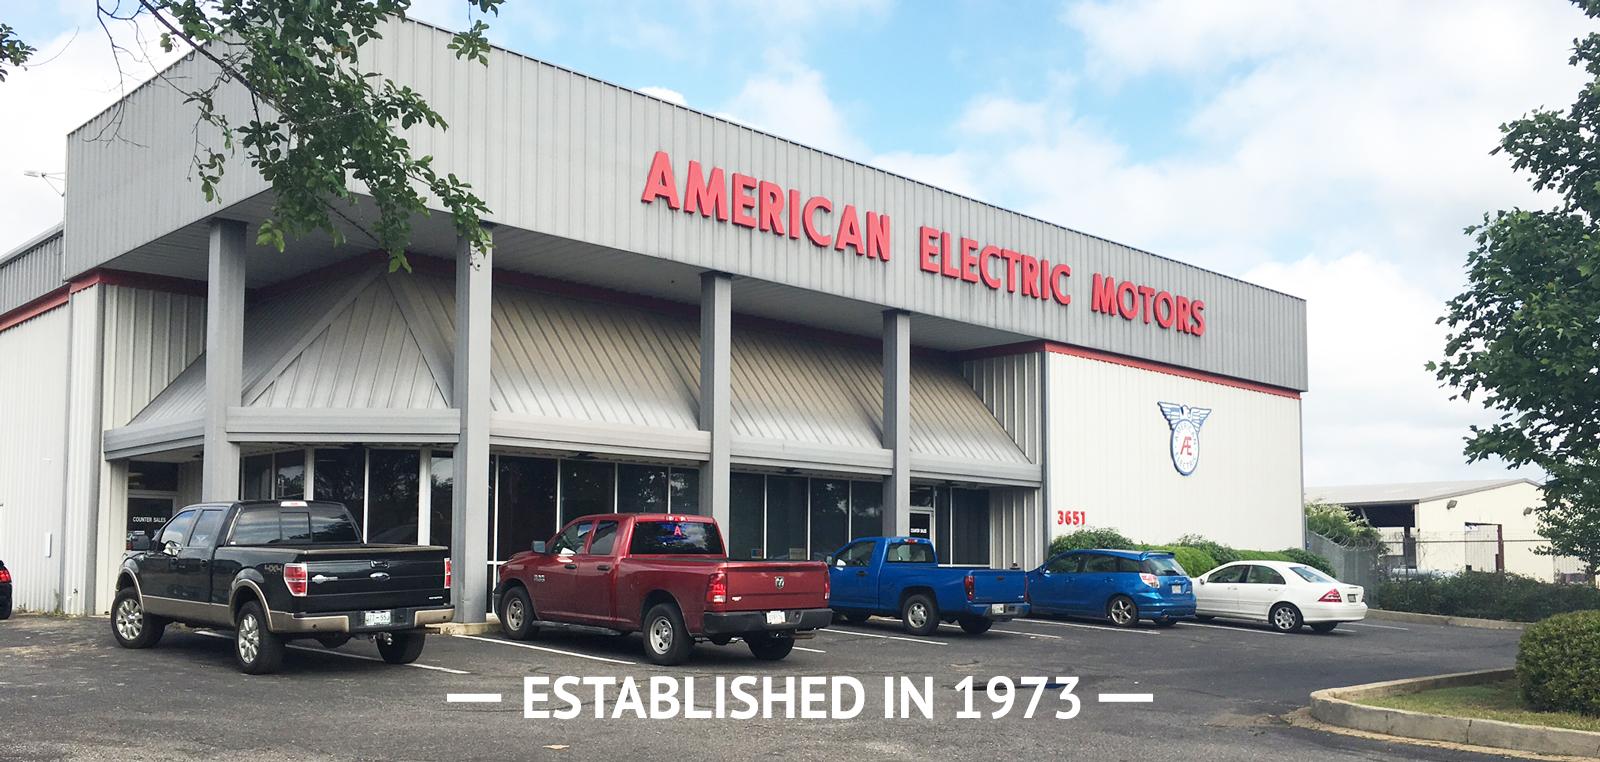 Compressor Motor Repair Ingersol Rand Sew Eurodrive Atlas Compco On Site Maintenance American Electric Motors